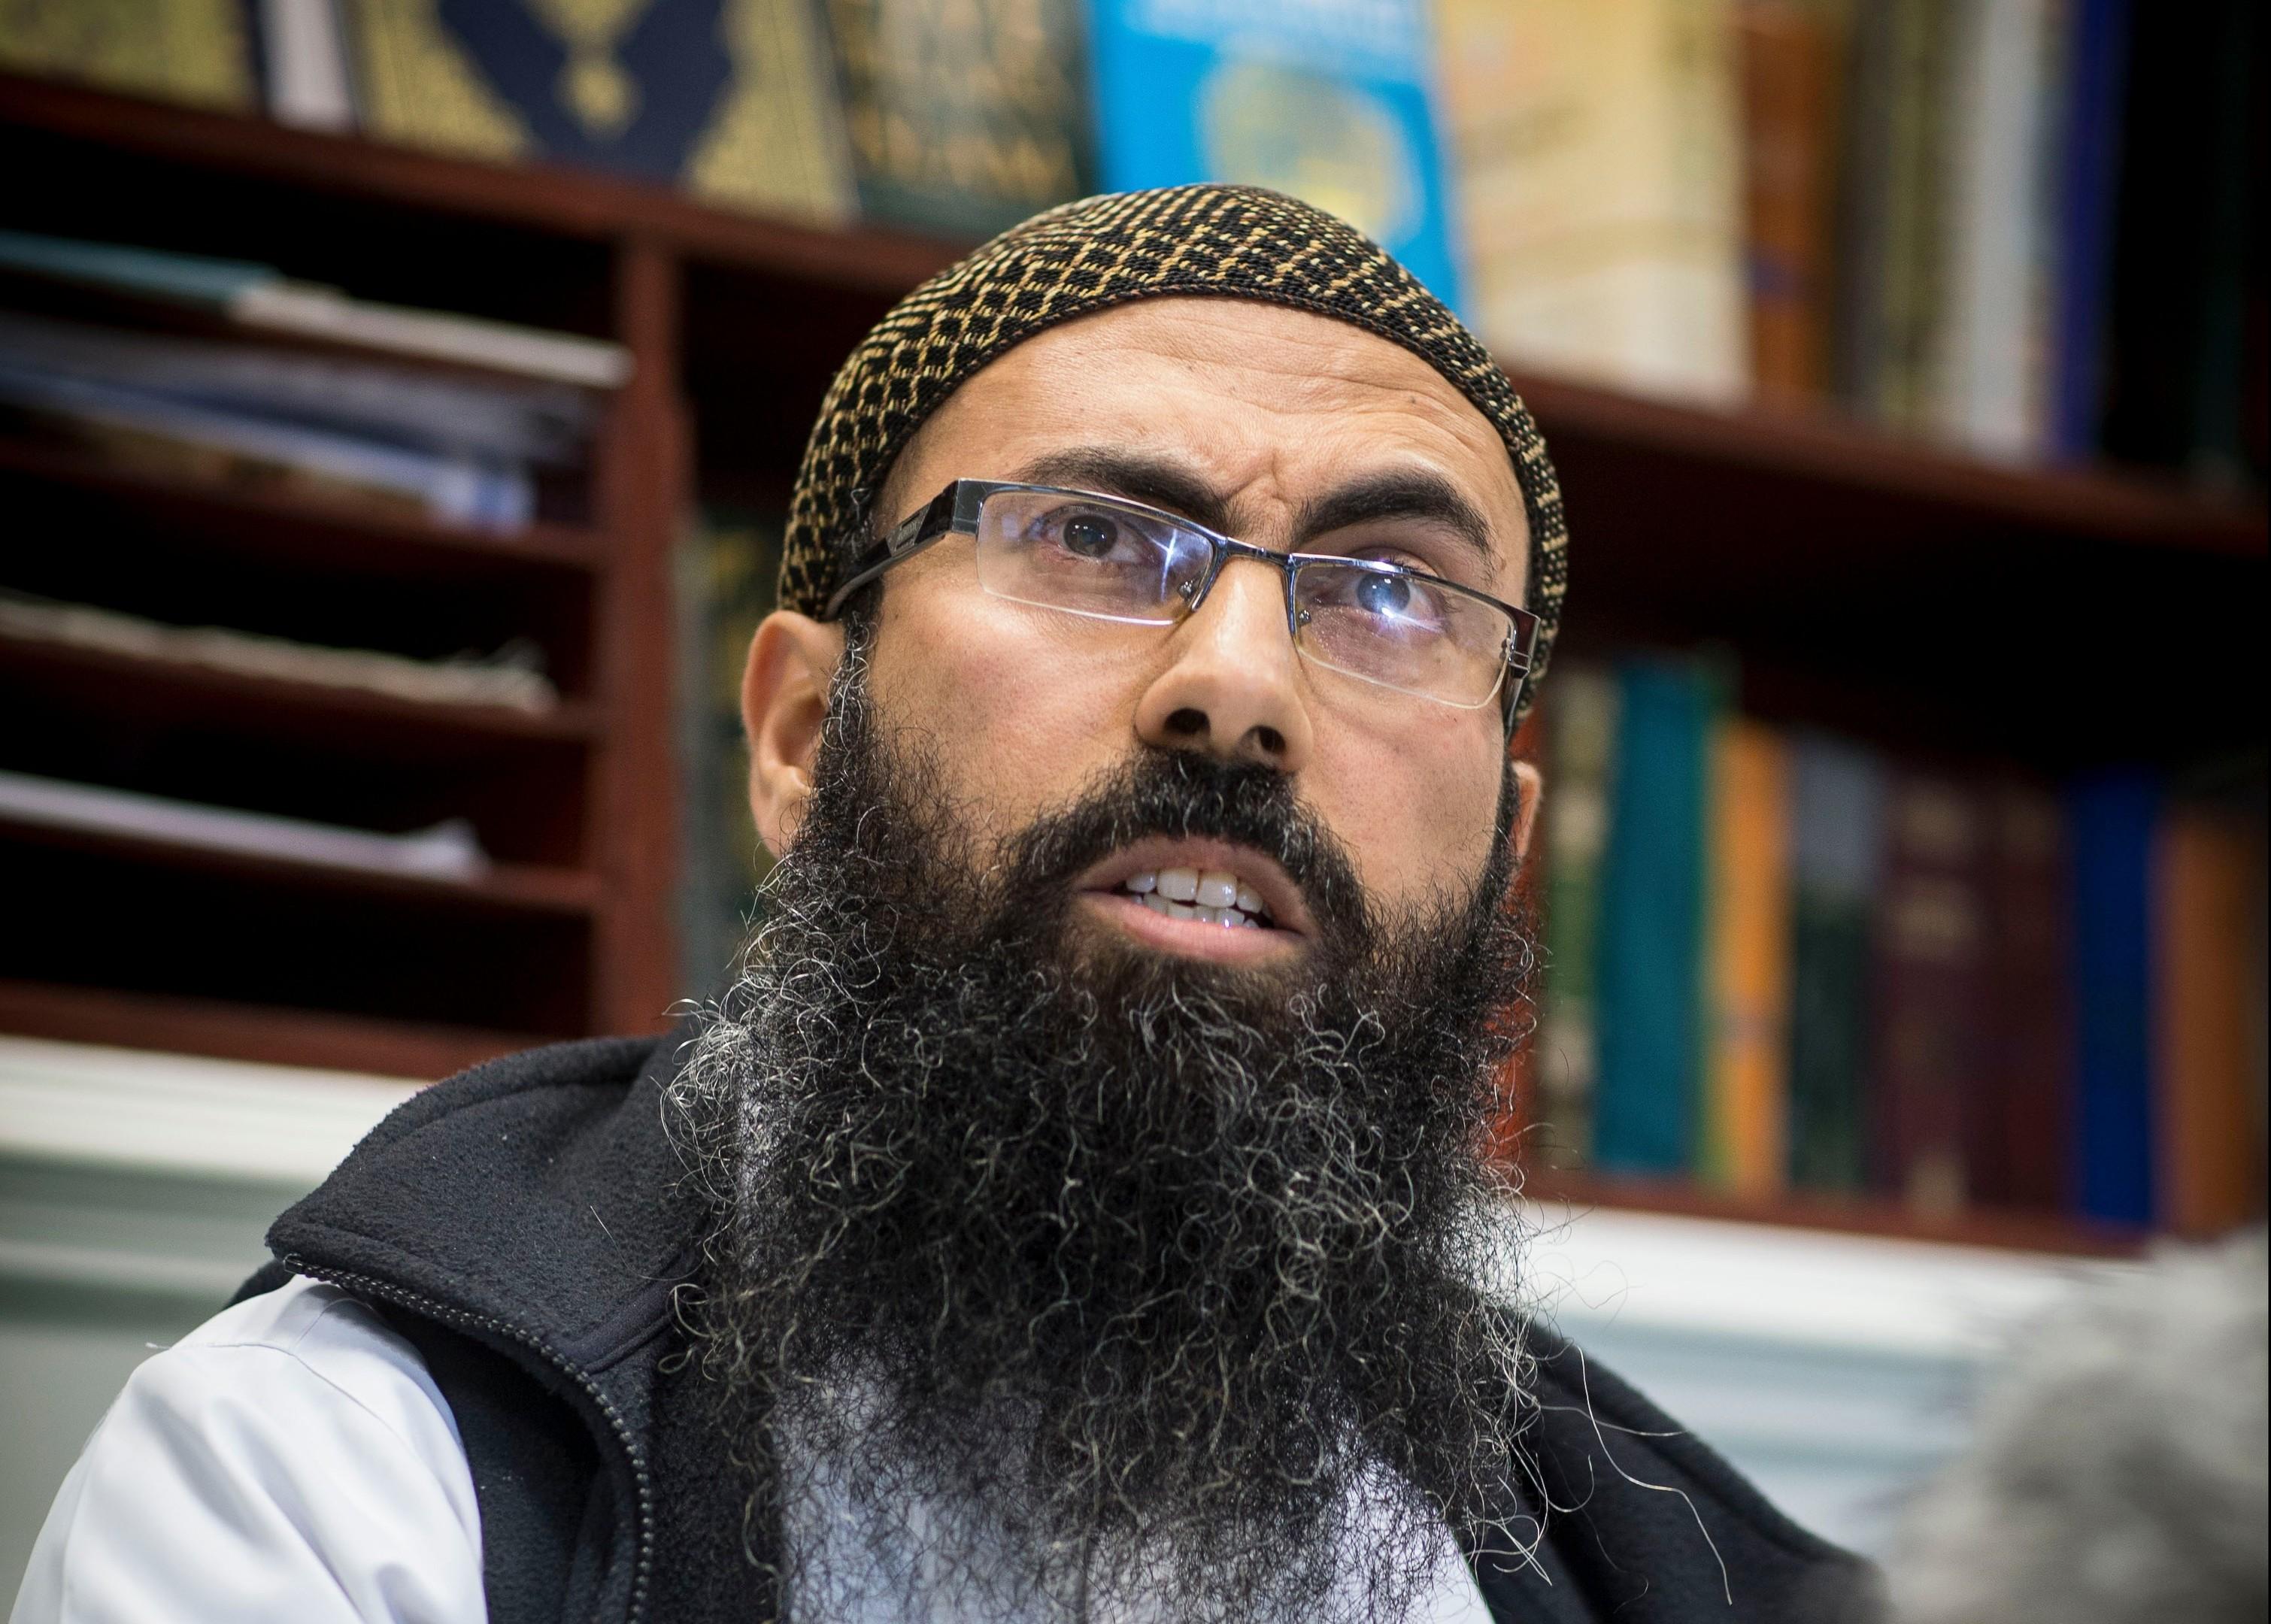 Imam Ibrahim Alwawi.